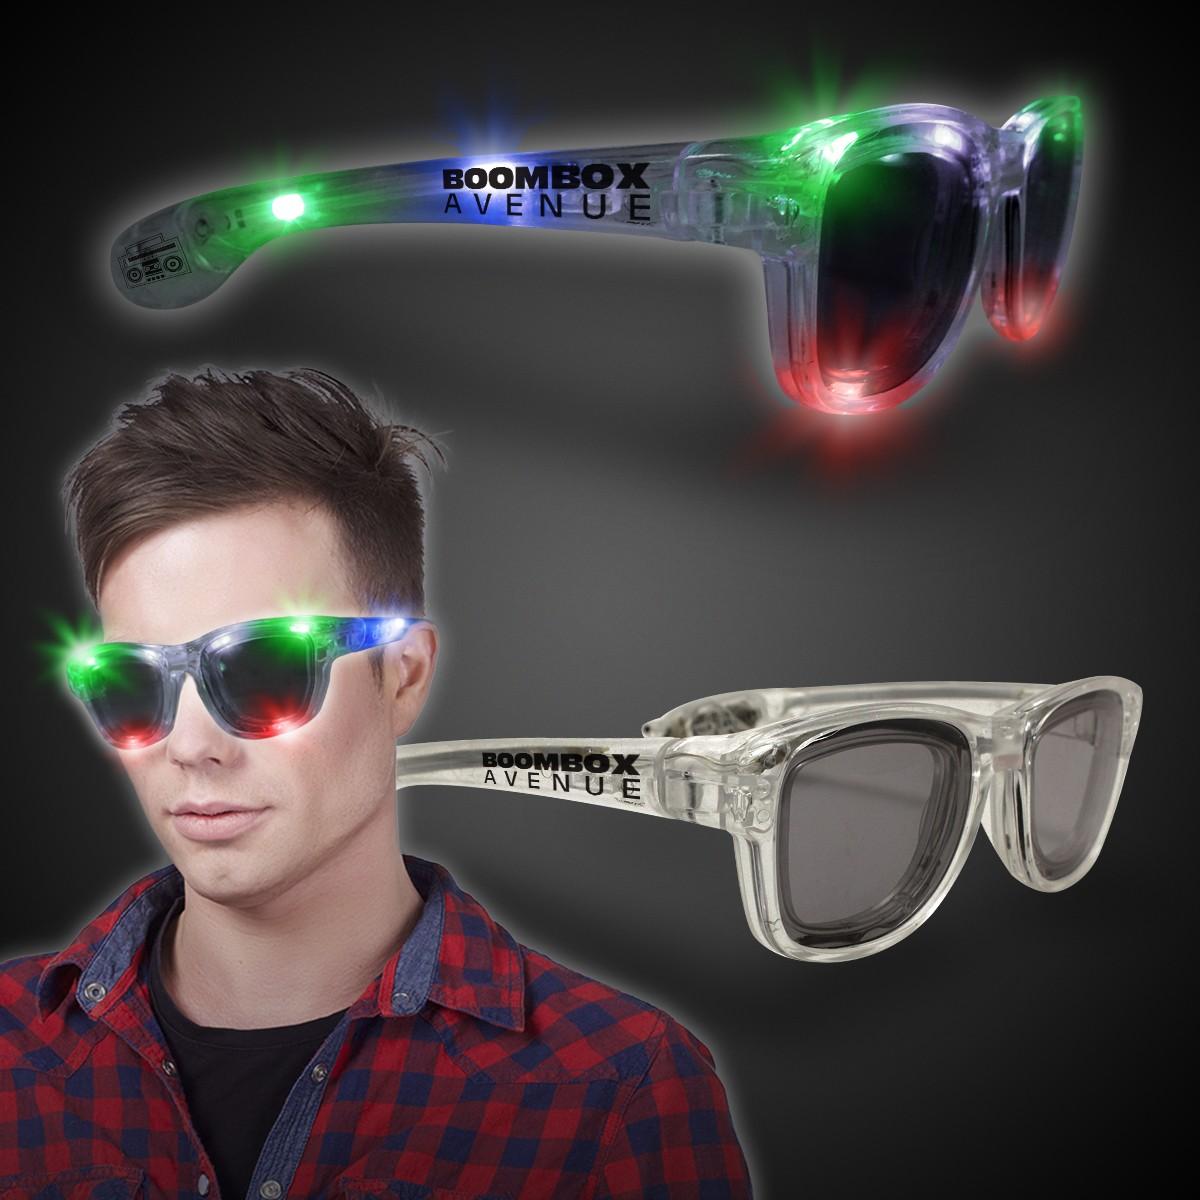 Multi Color LED Classic Retro Sunglasses with Sound Option